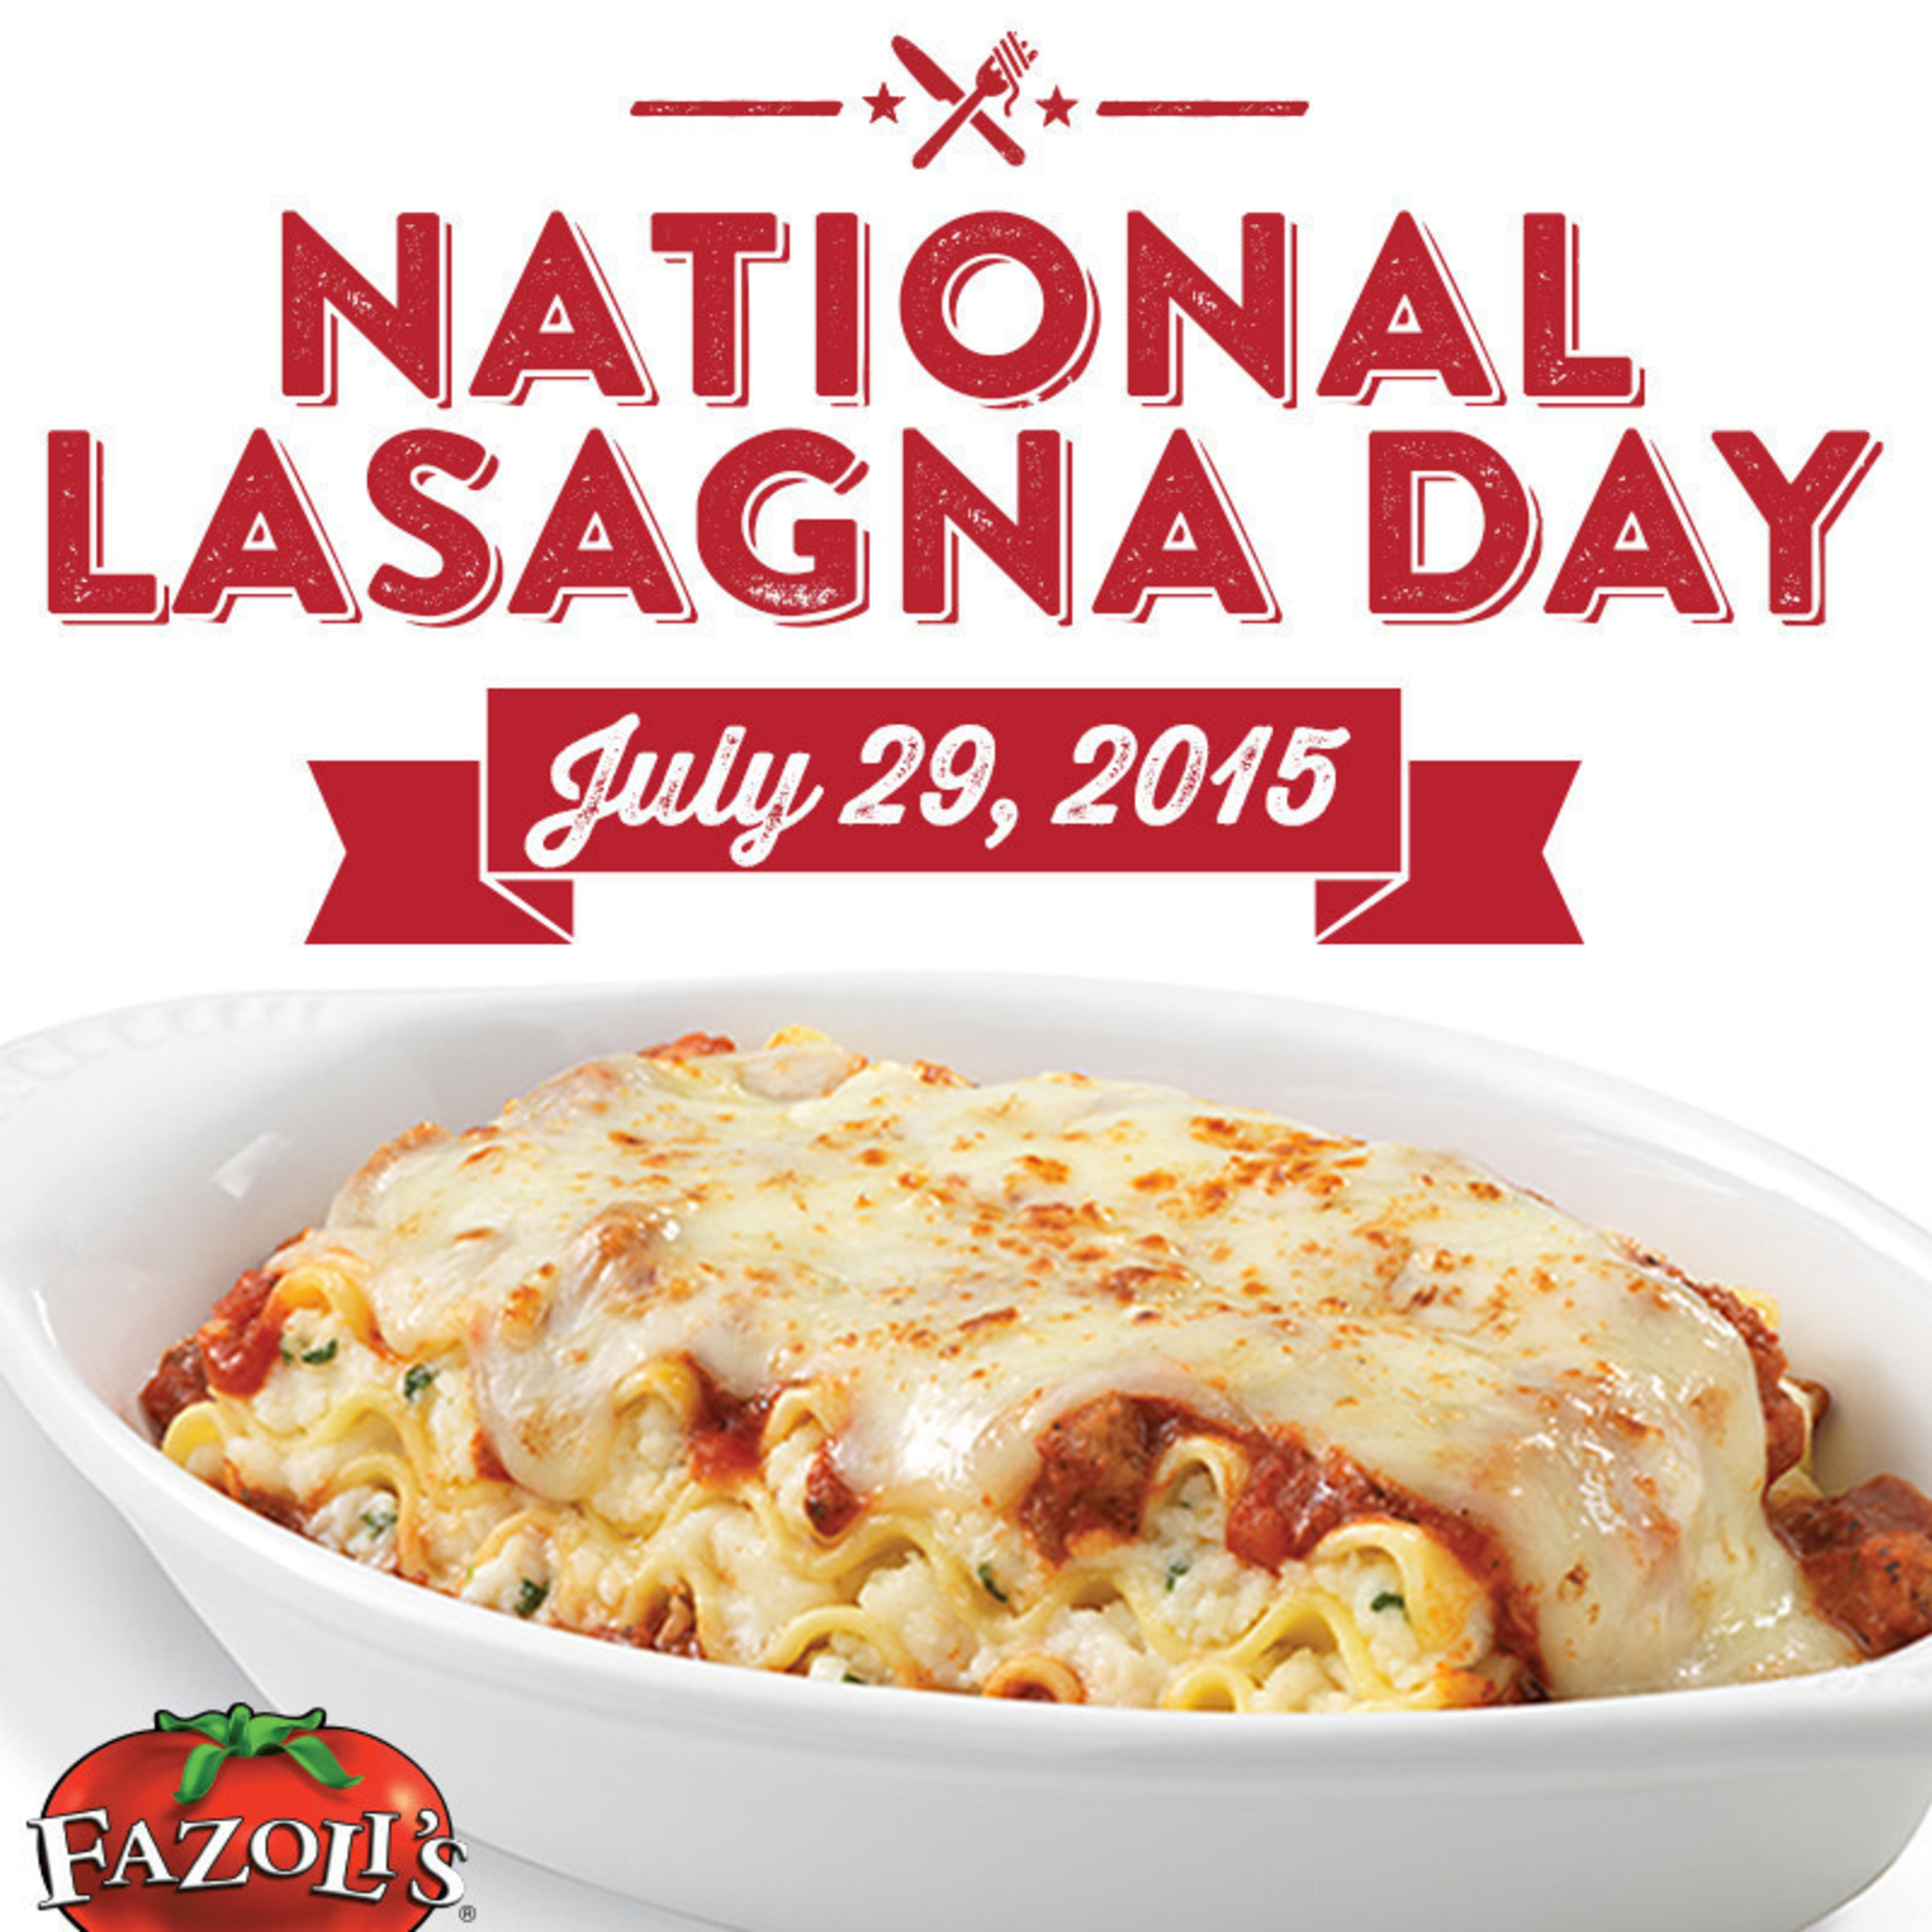 Lasagna Lovers Rejoice Fazoli S Celebrates National Lasagna Day